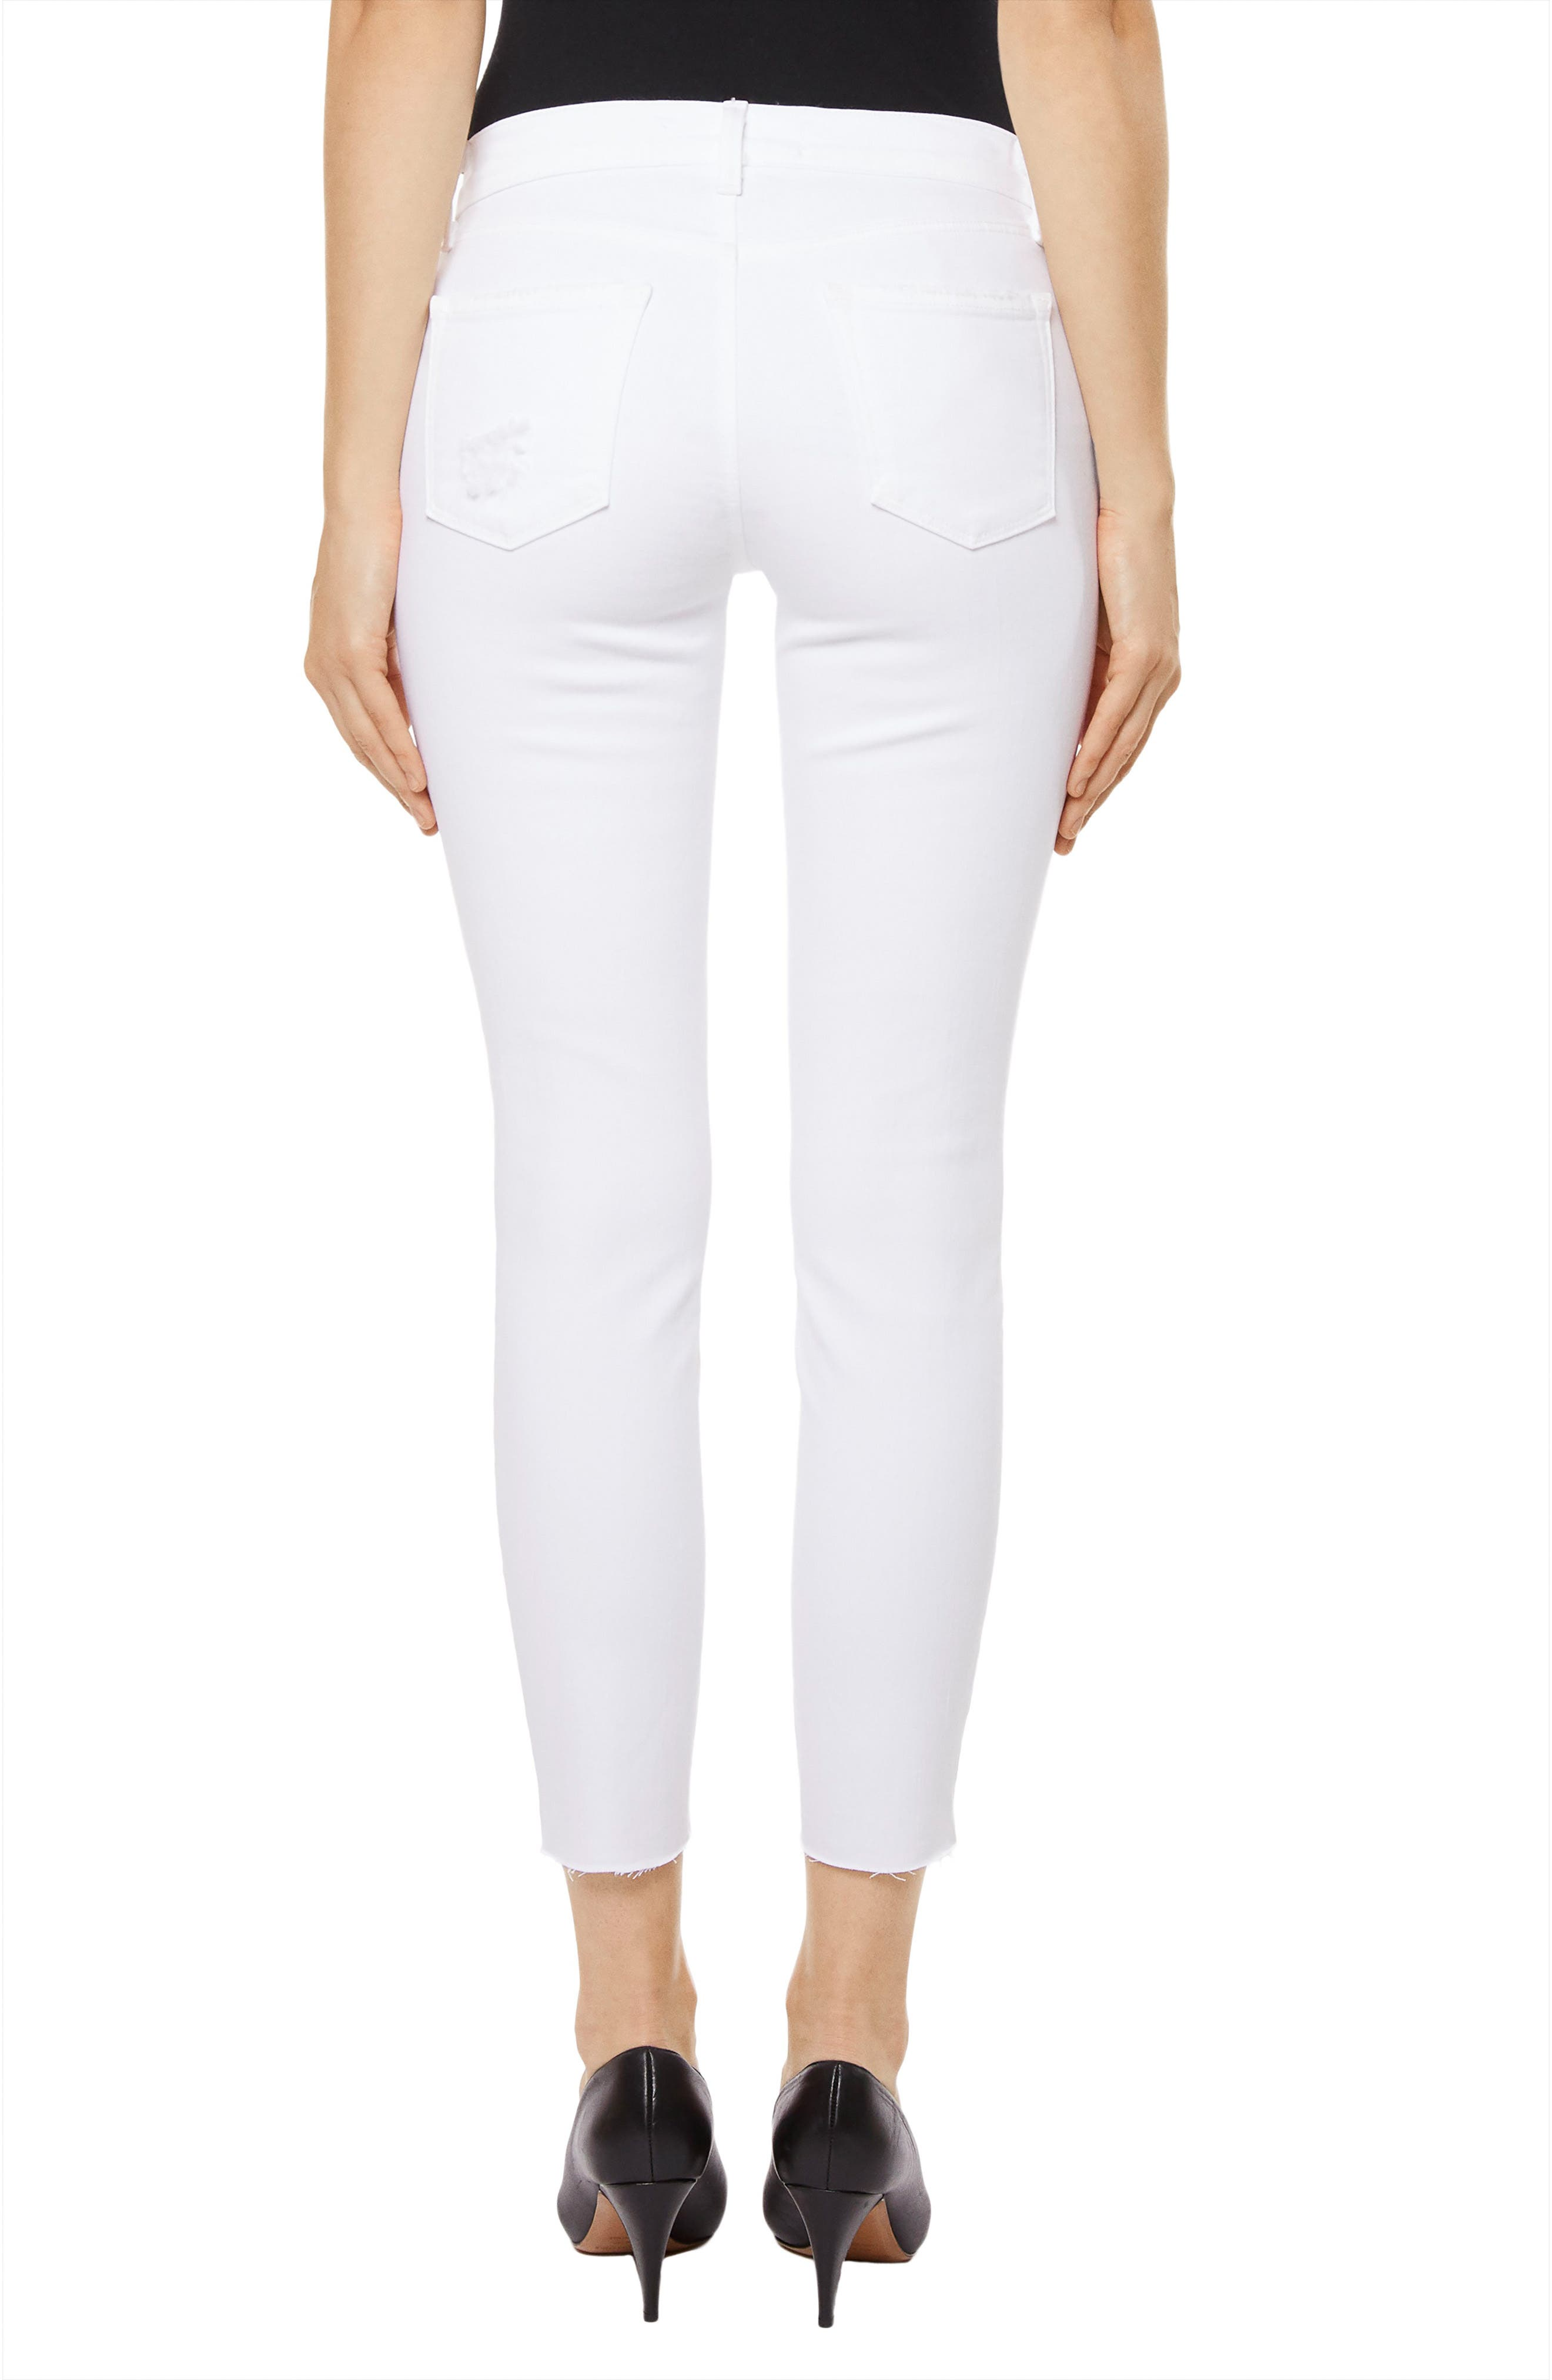 835 Capri Skinny Jeans,                             Alternate thumbnail 2, color,                             Underexposed